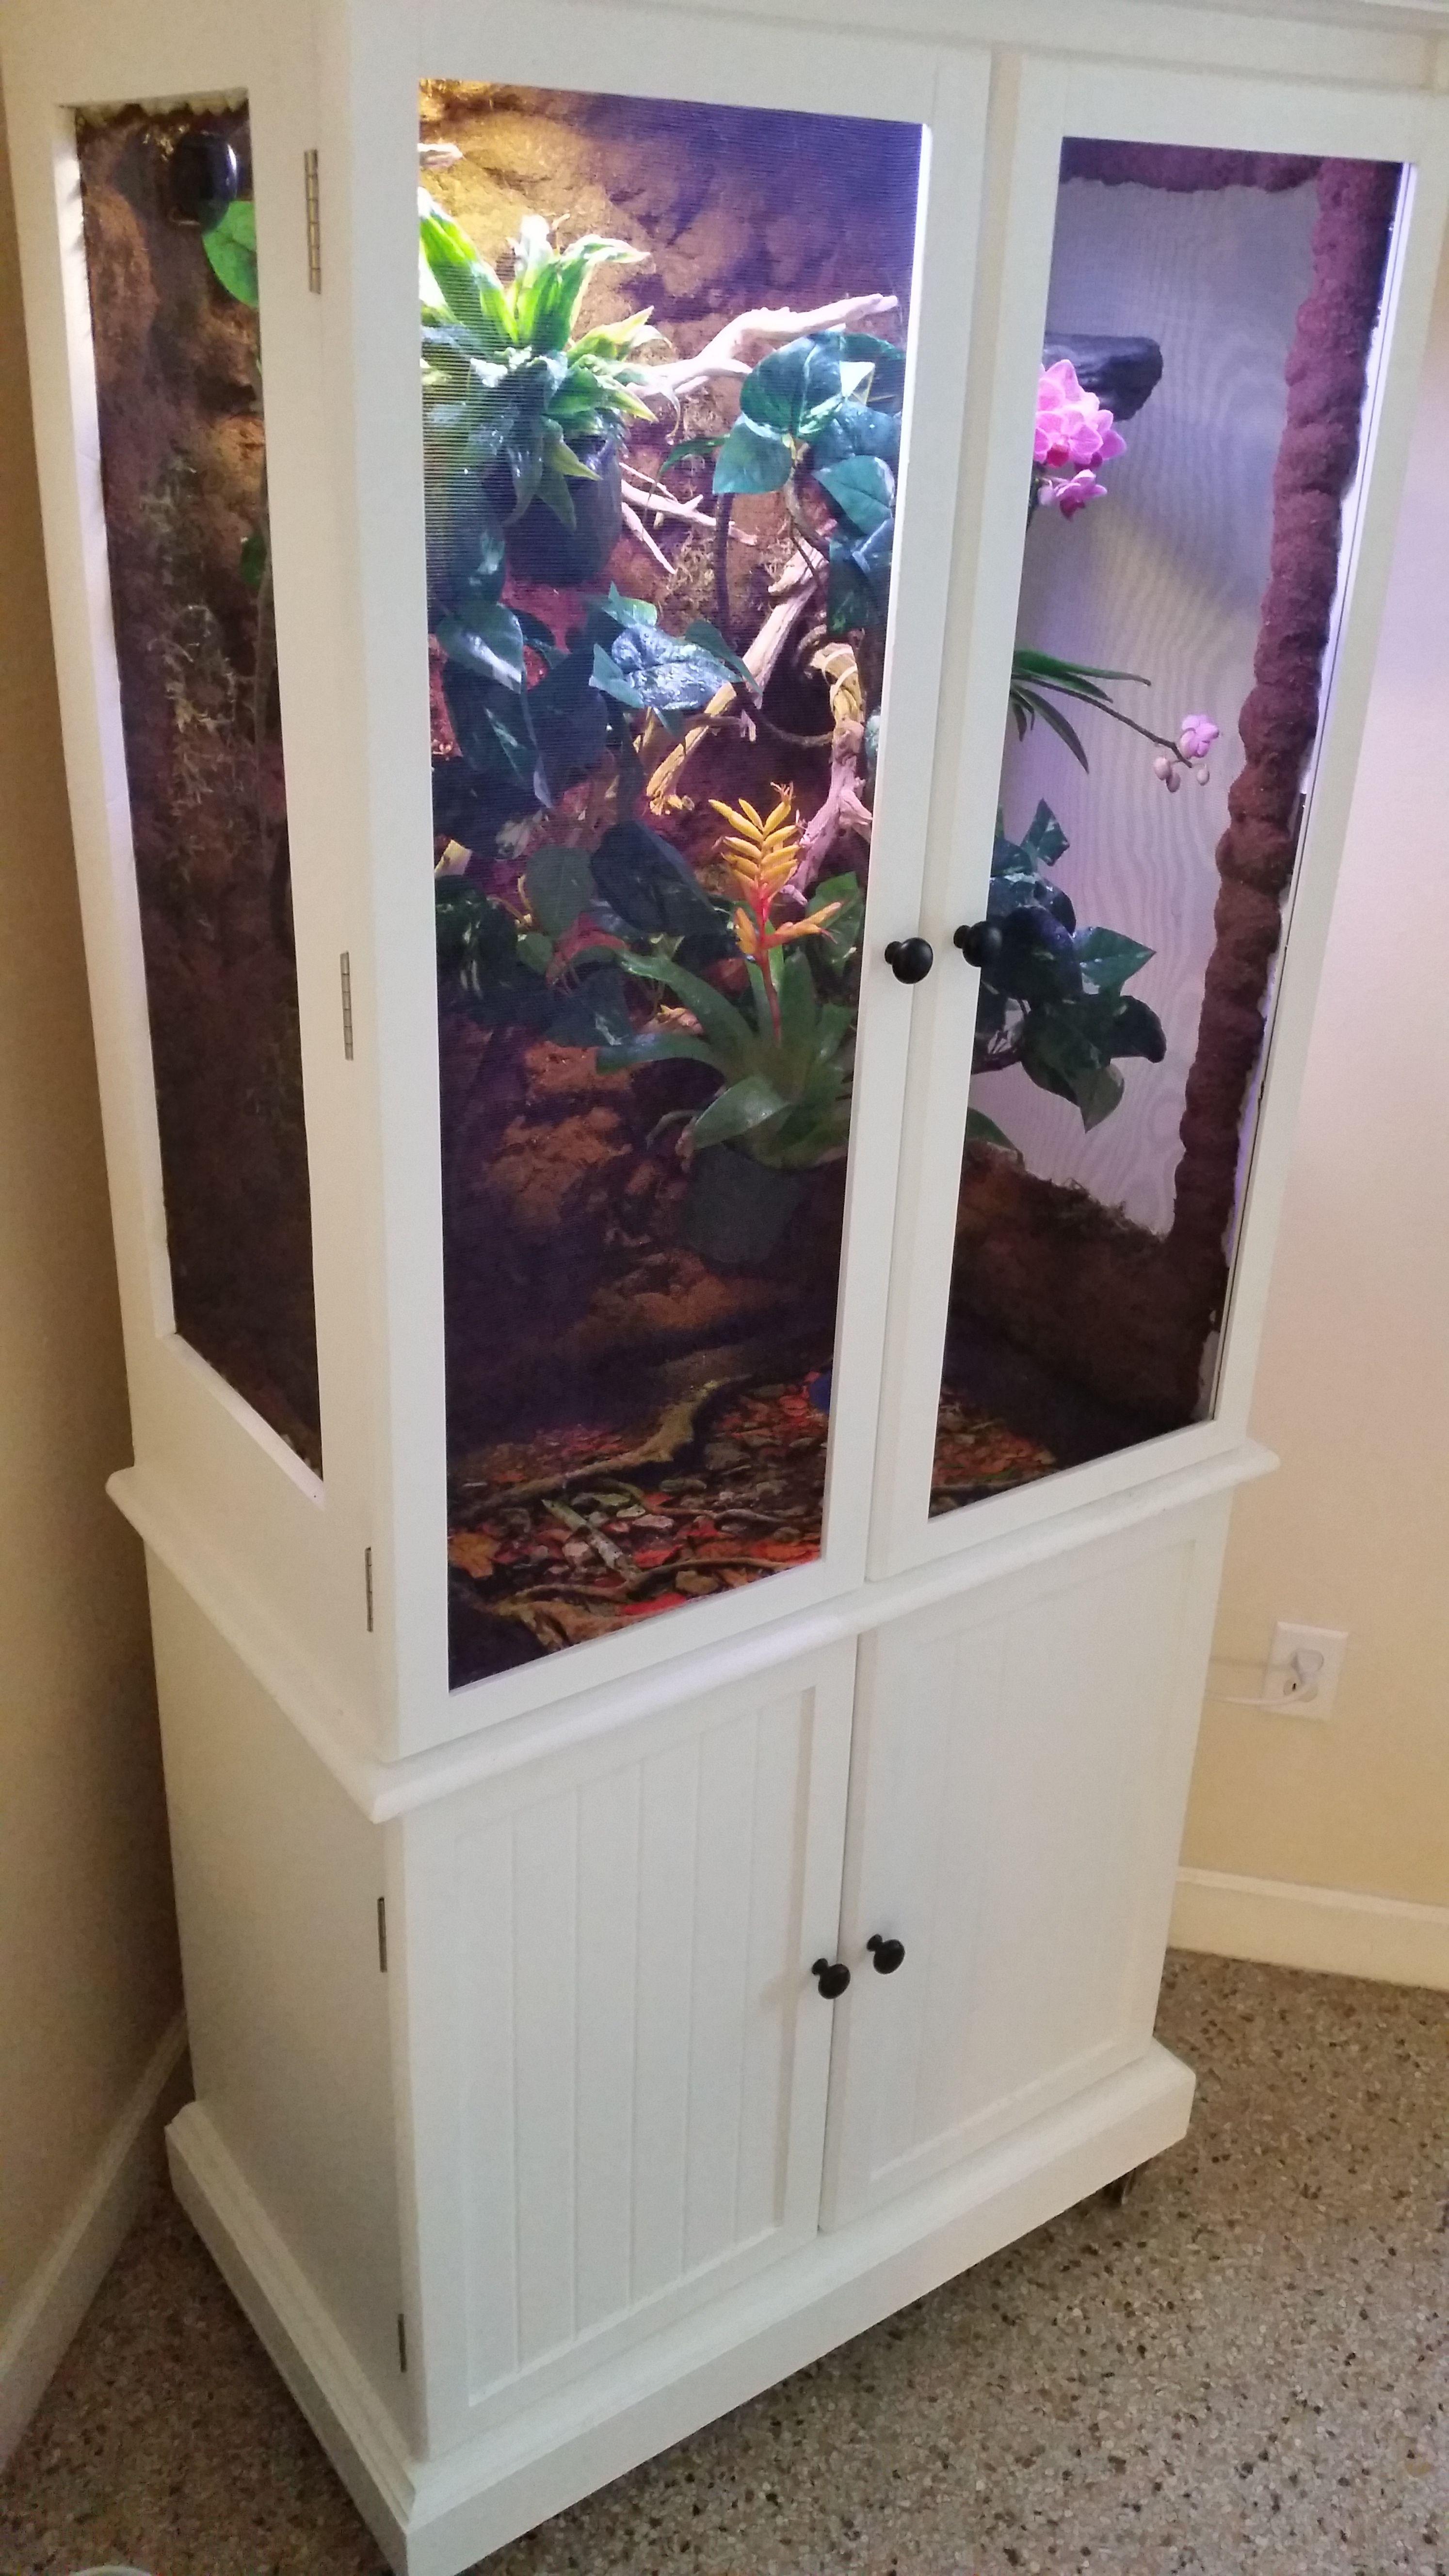 Fully repurposed DIY Chameleon Vivarium. & Finally finished! Fully repurposed DIY Chameleon Vivarium. | DIY ... Pezcame.Com